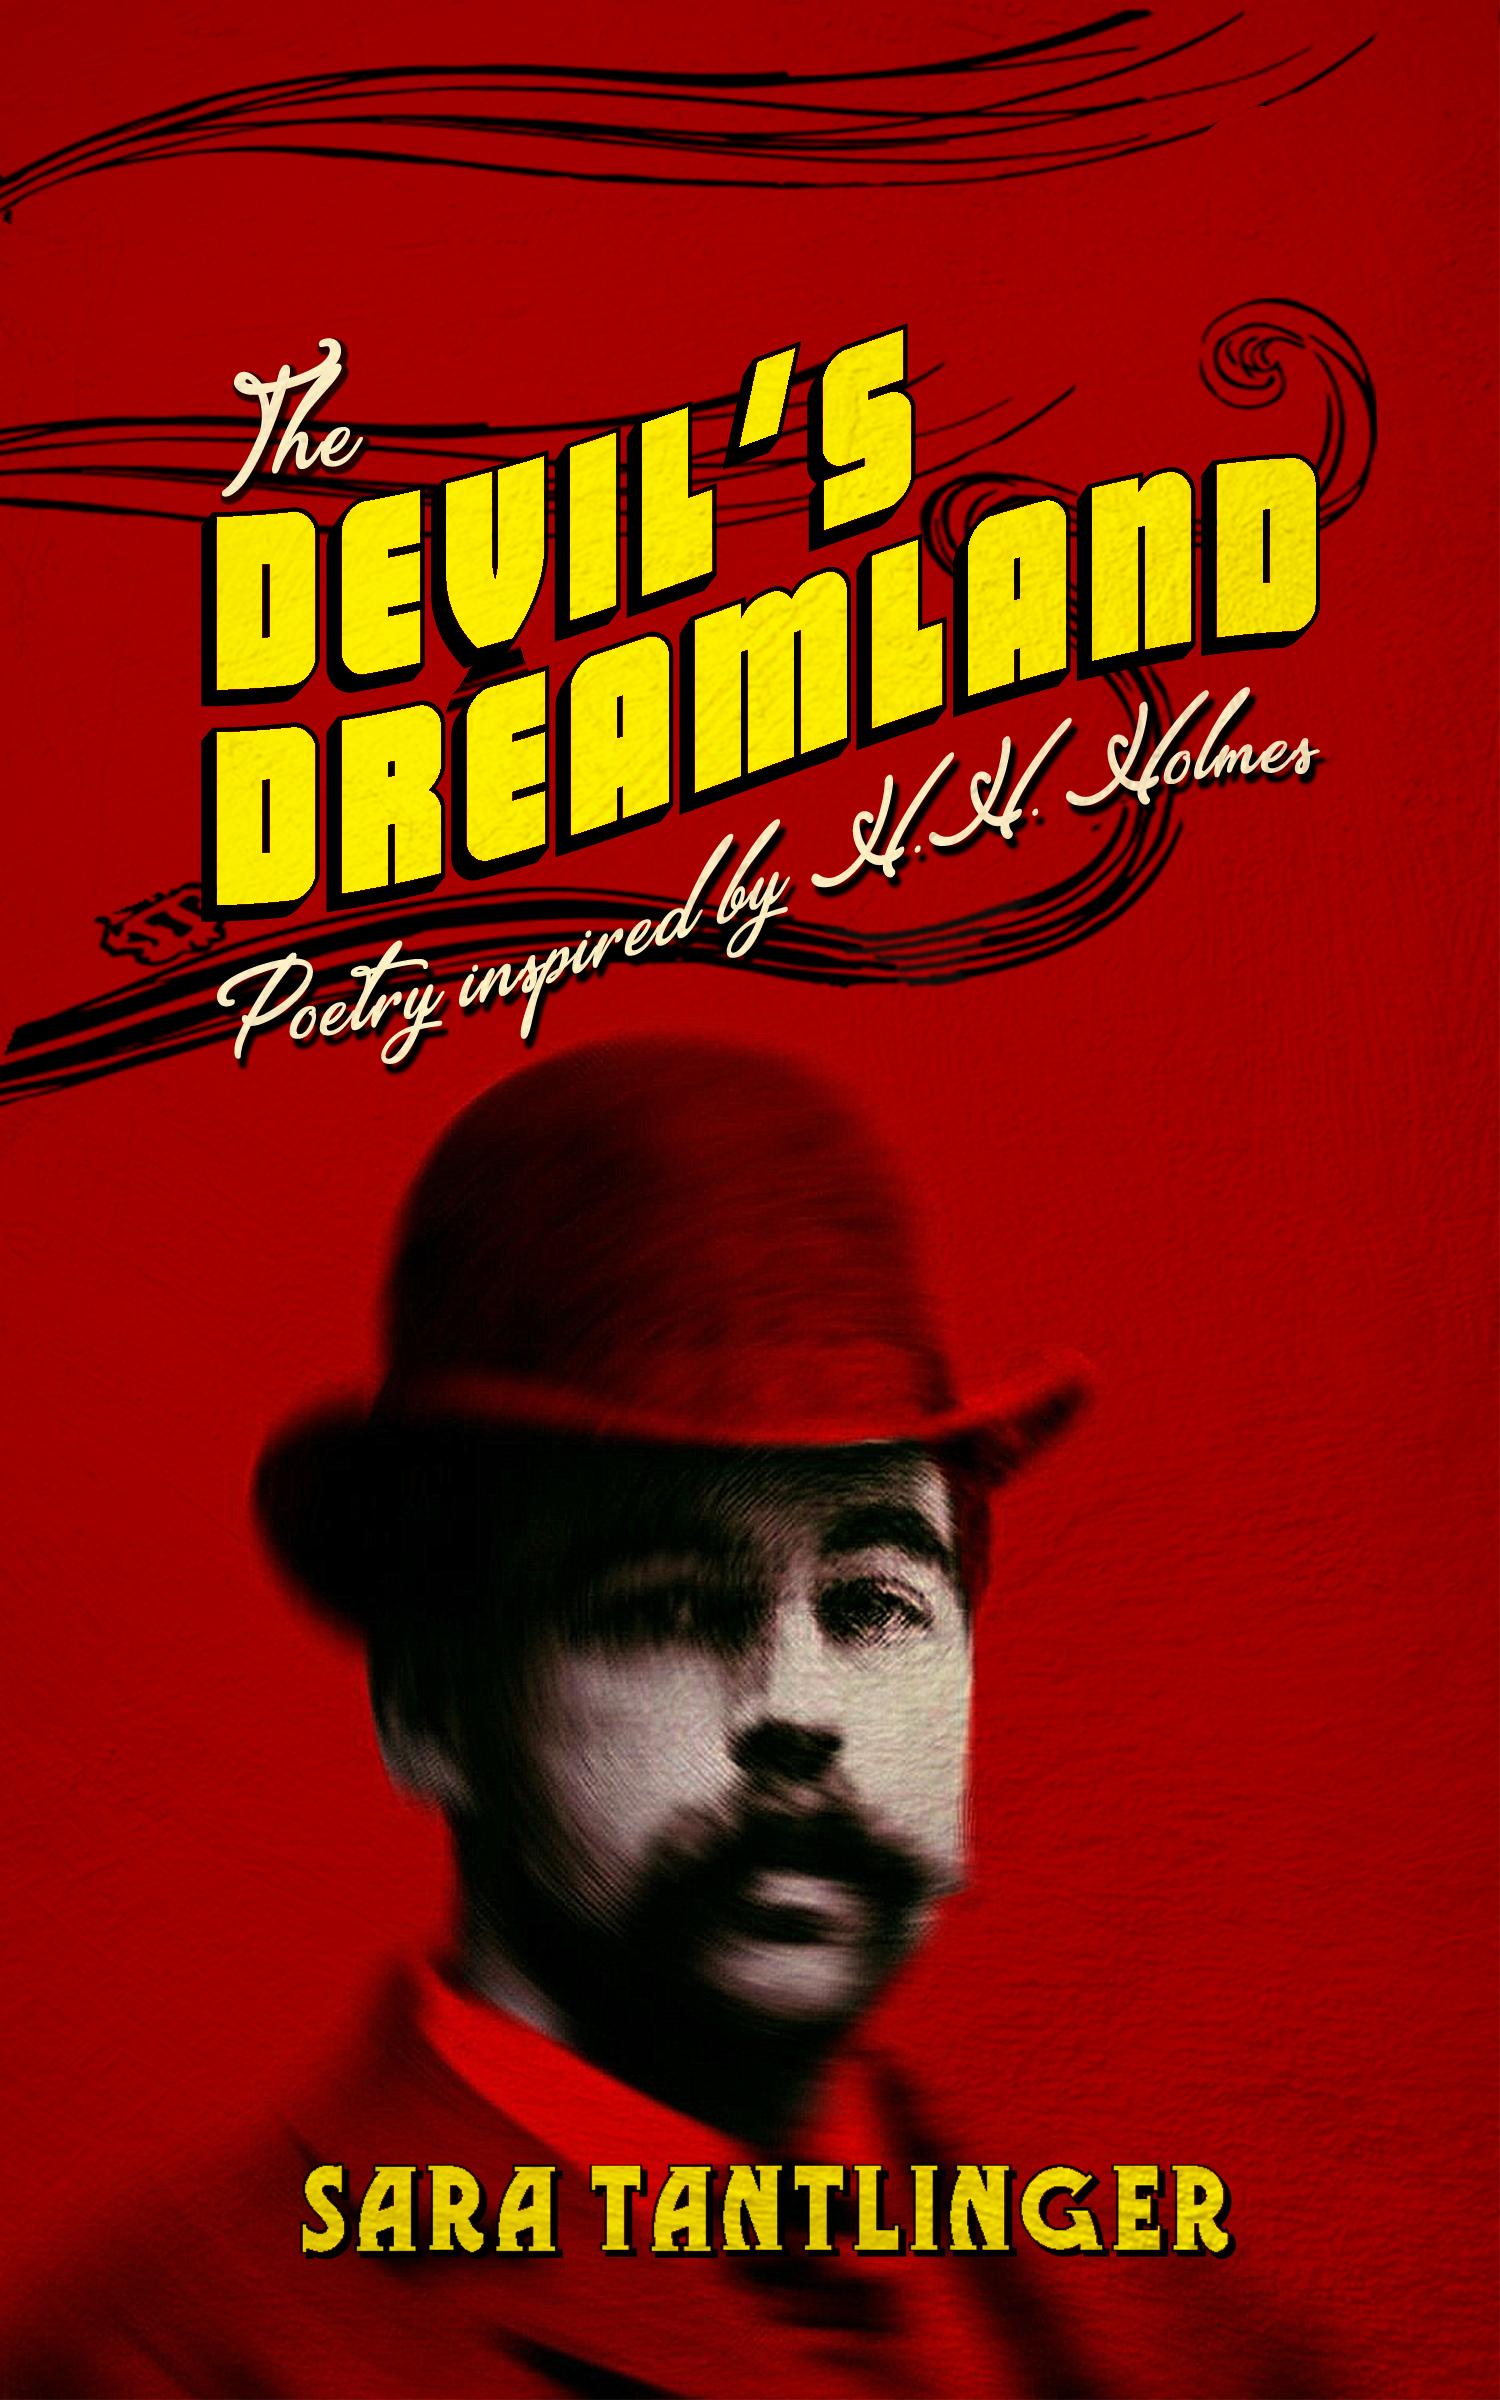 The Devil's Dreamland full rez.jpg